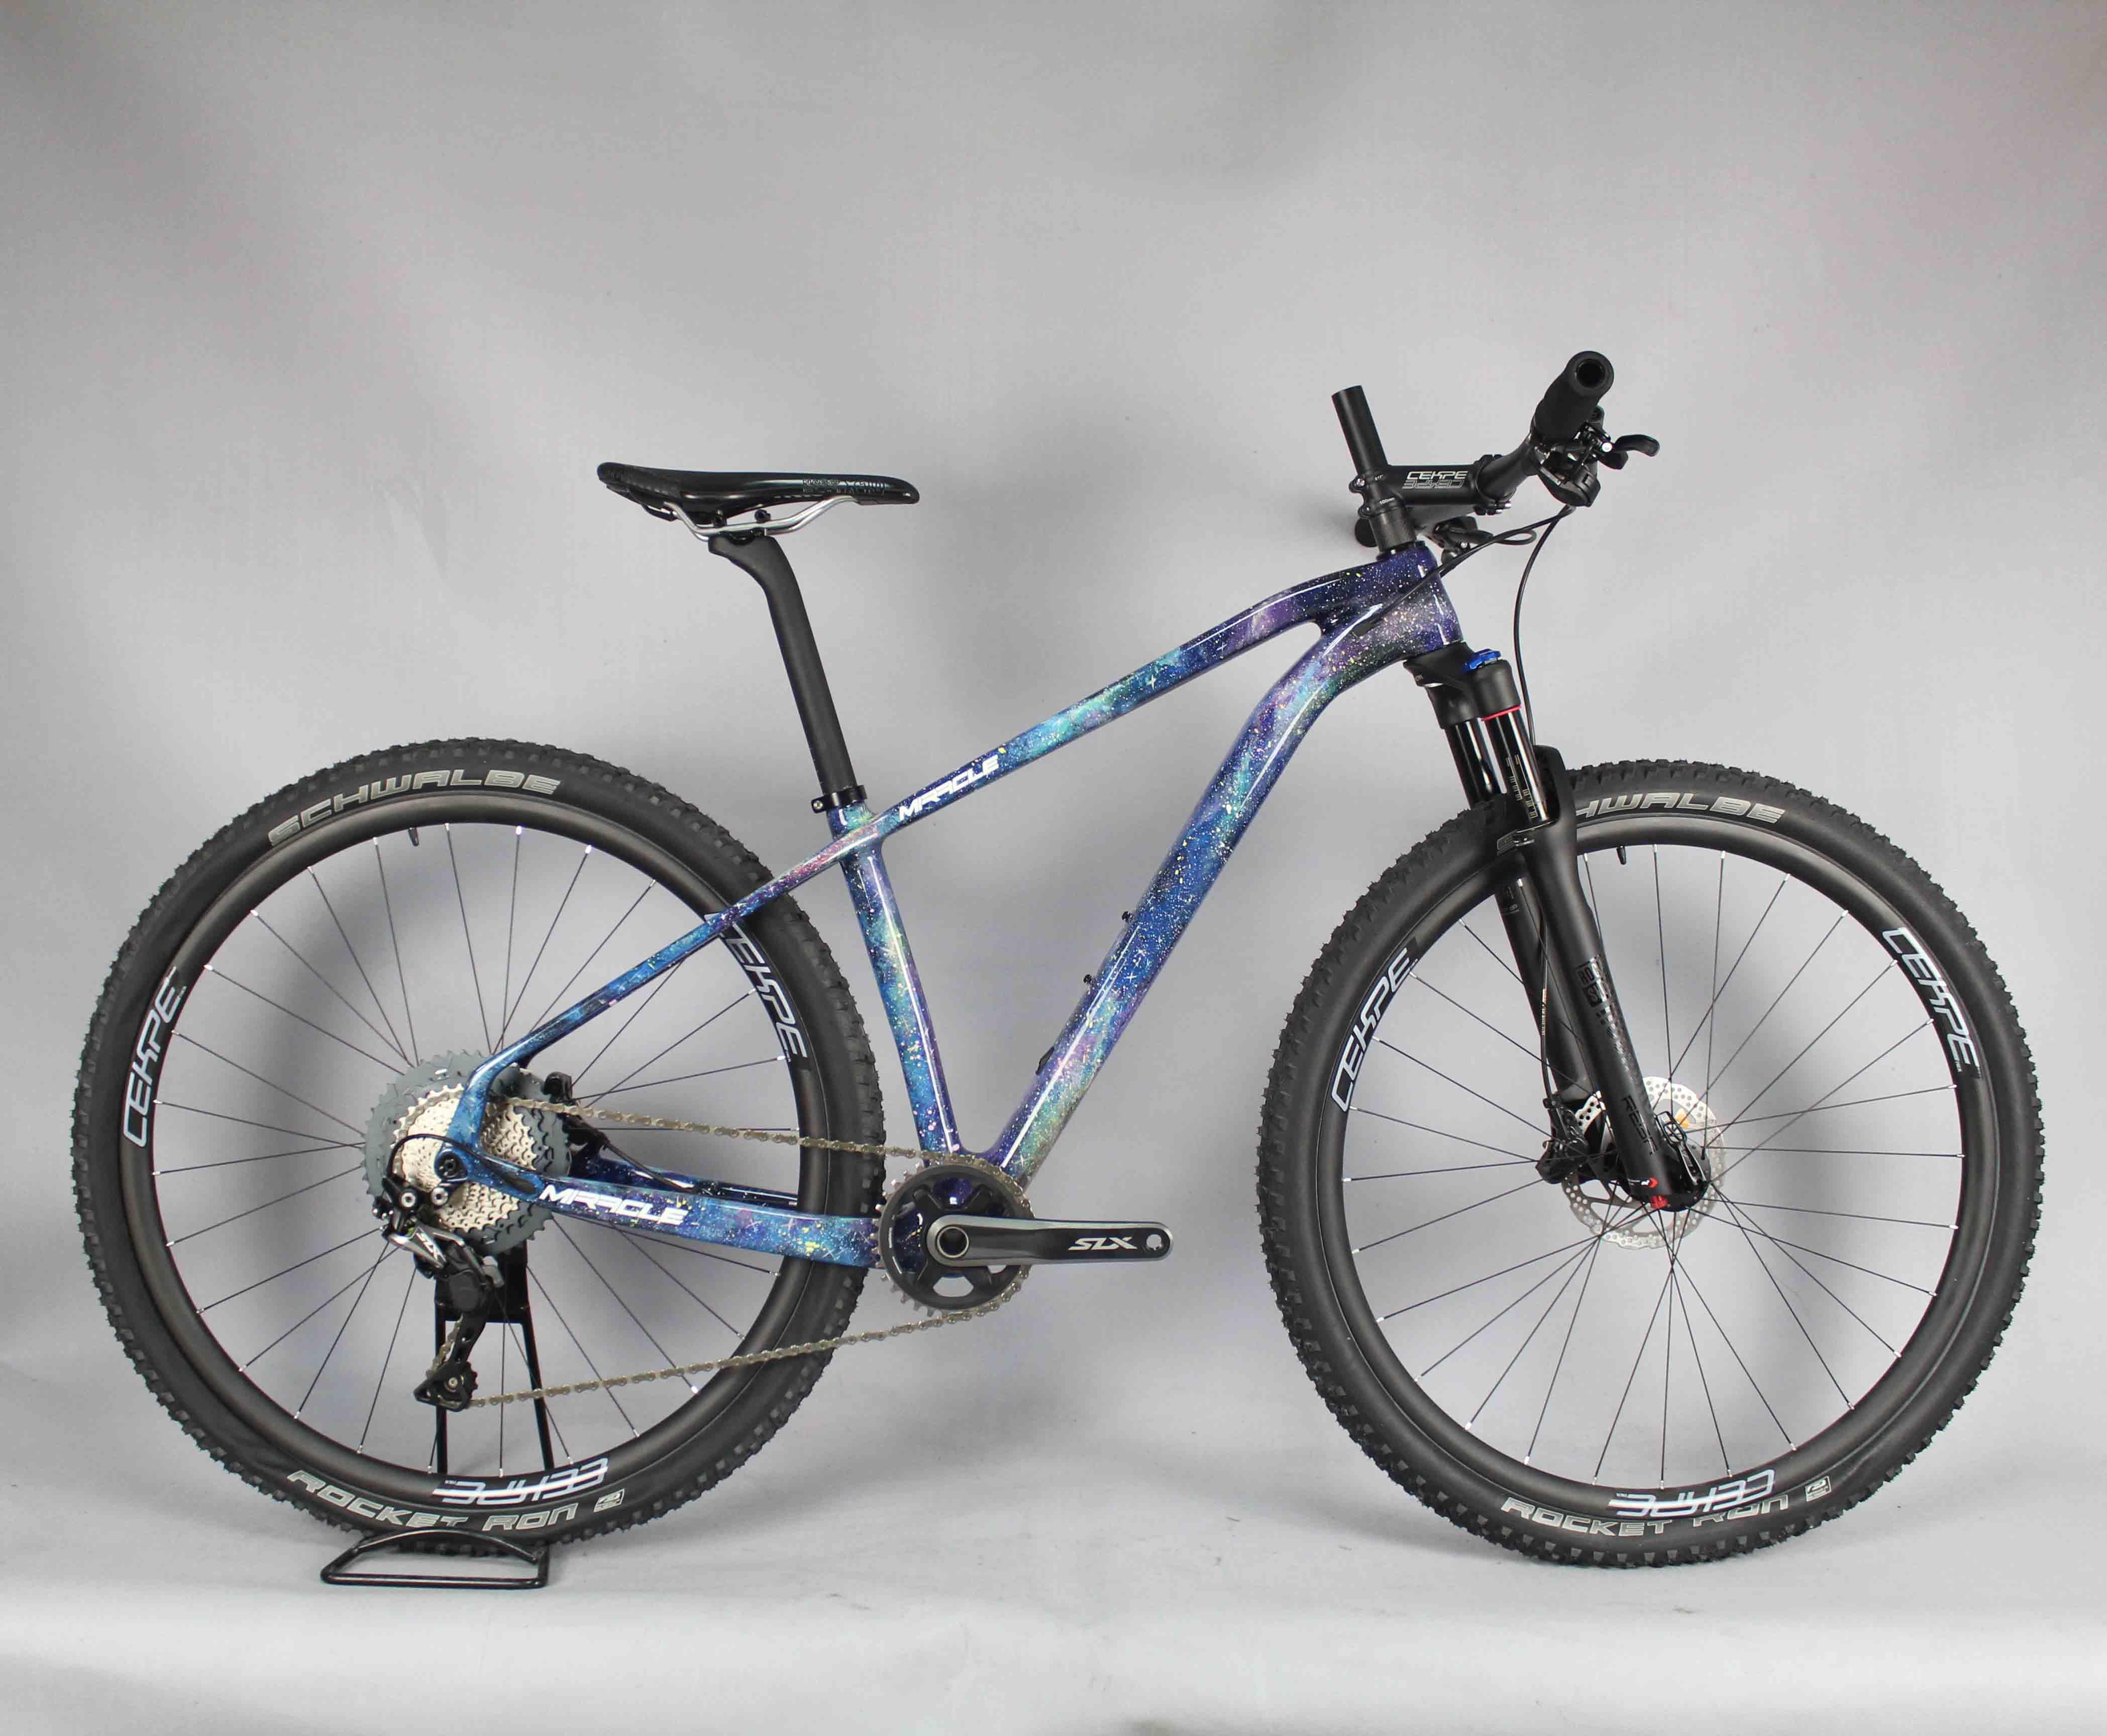 MIRACLE T1000 Carbon Fiber BOOST bikes 29er XC MTB Mountain bike 15 17 19 inch